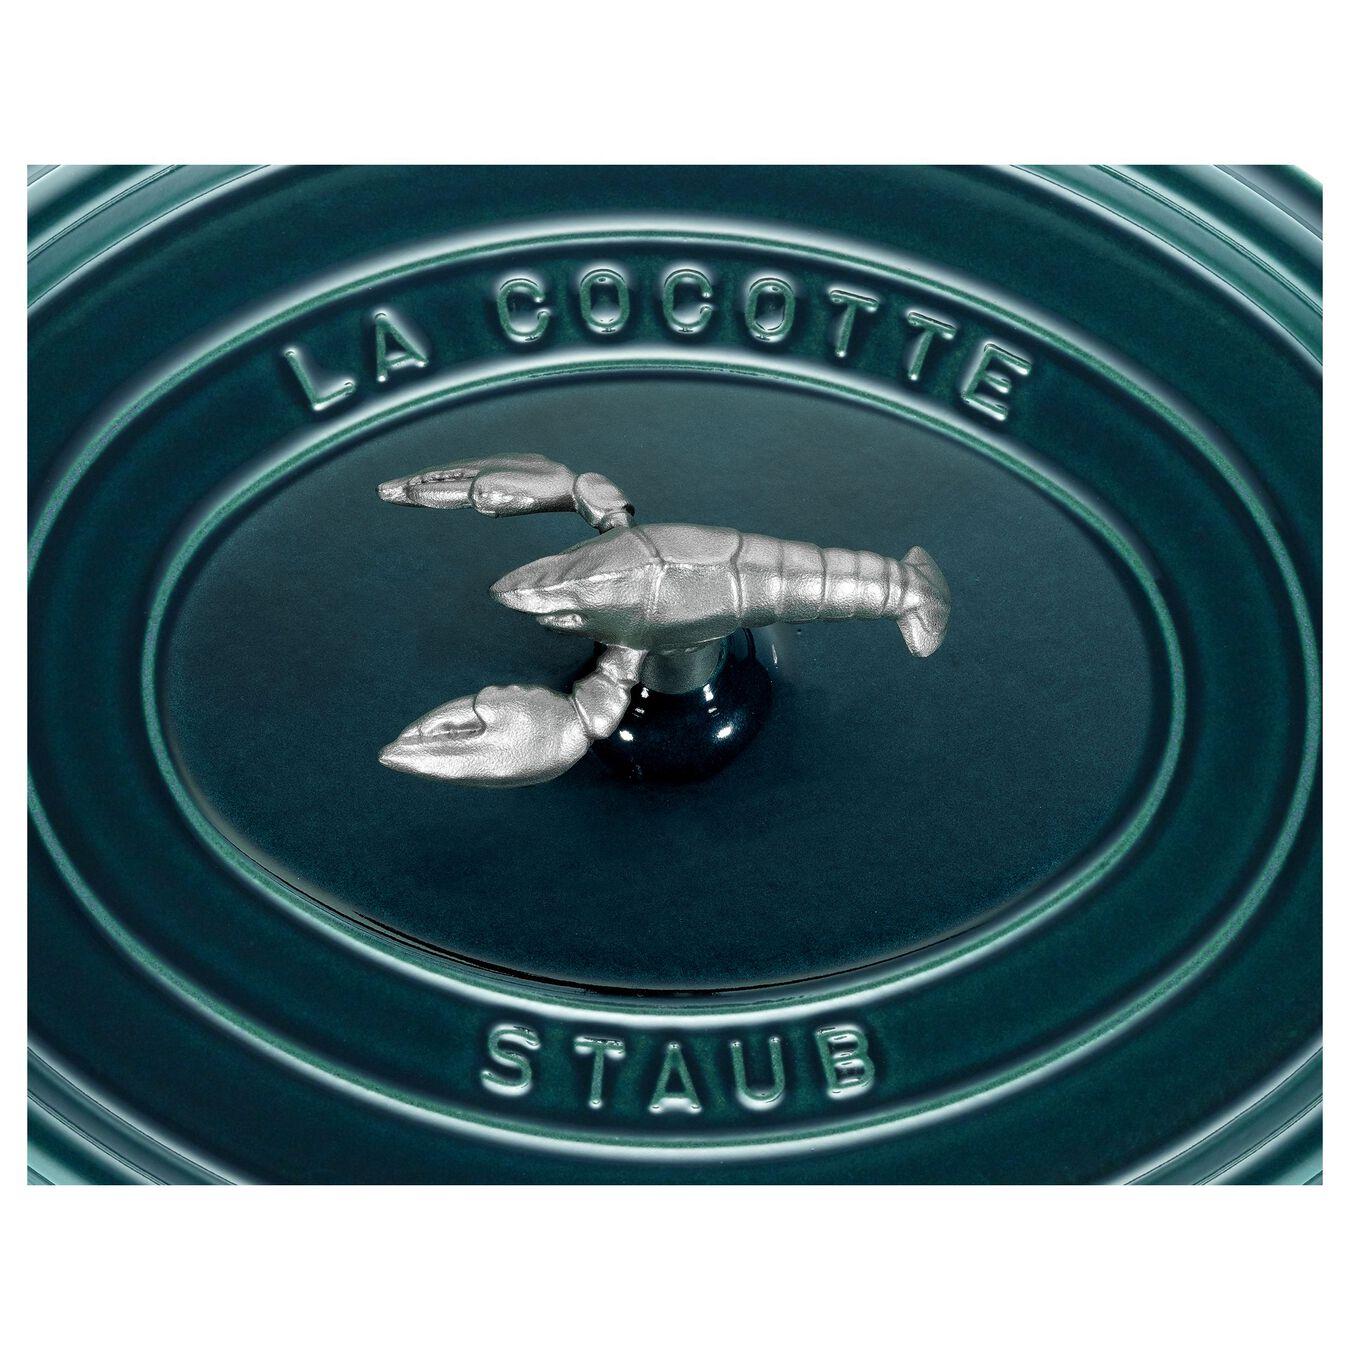 Cocotte bouton homard 31 cm, Ovale, Blue La-Mer, Fonte,,large 7